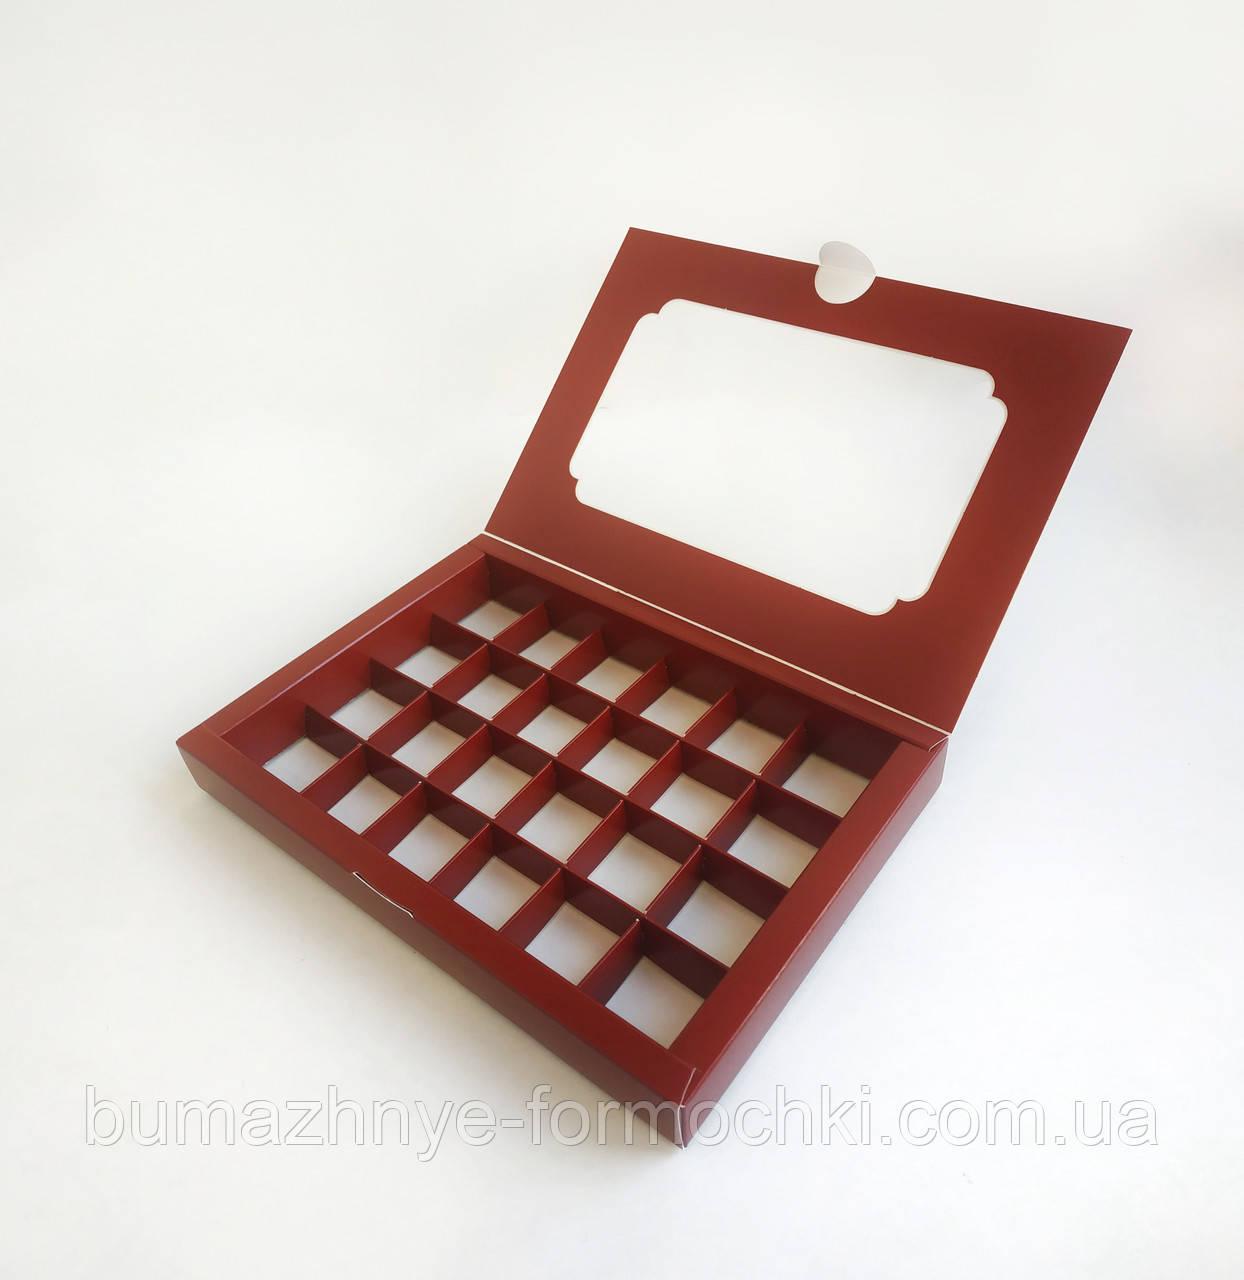 Коробка на 24 конфеты, бордовая, 270*185*30